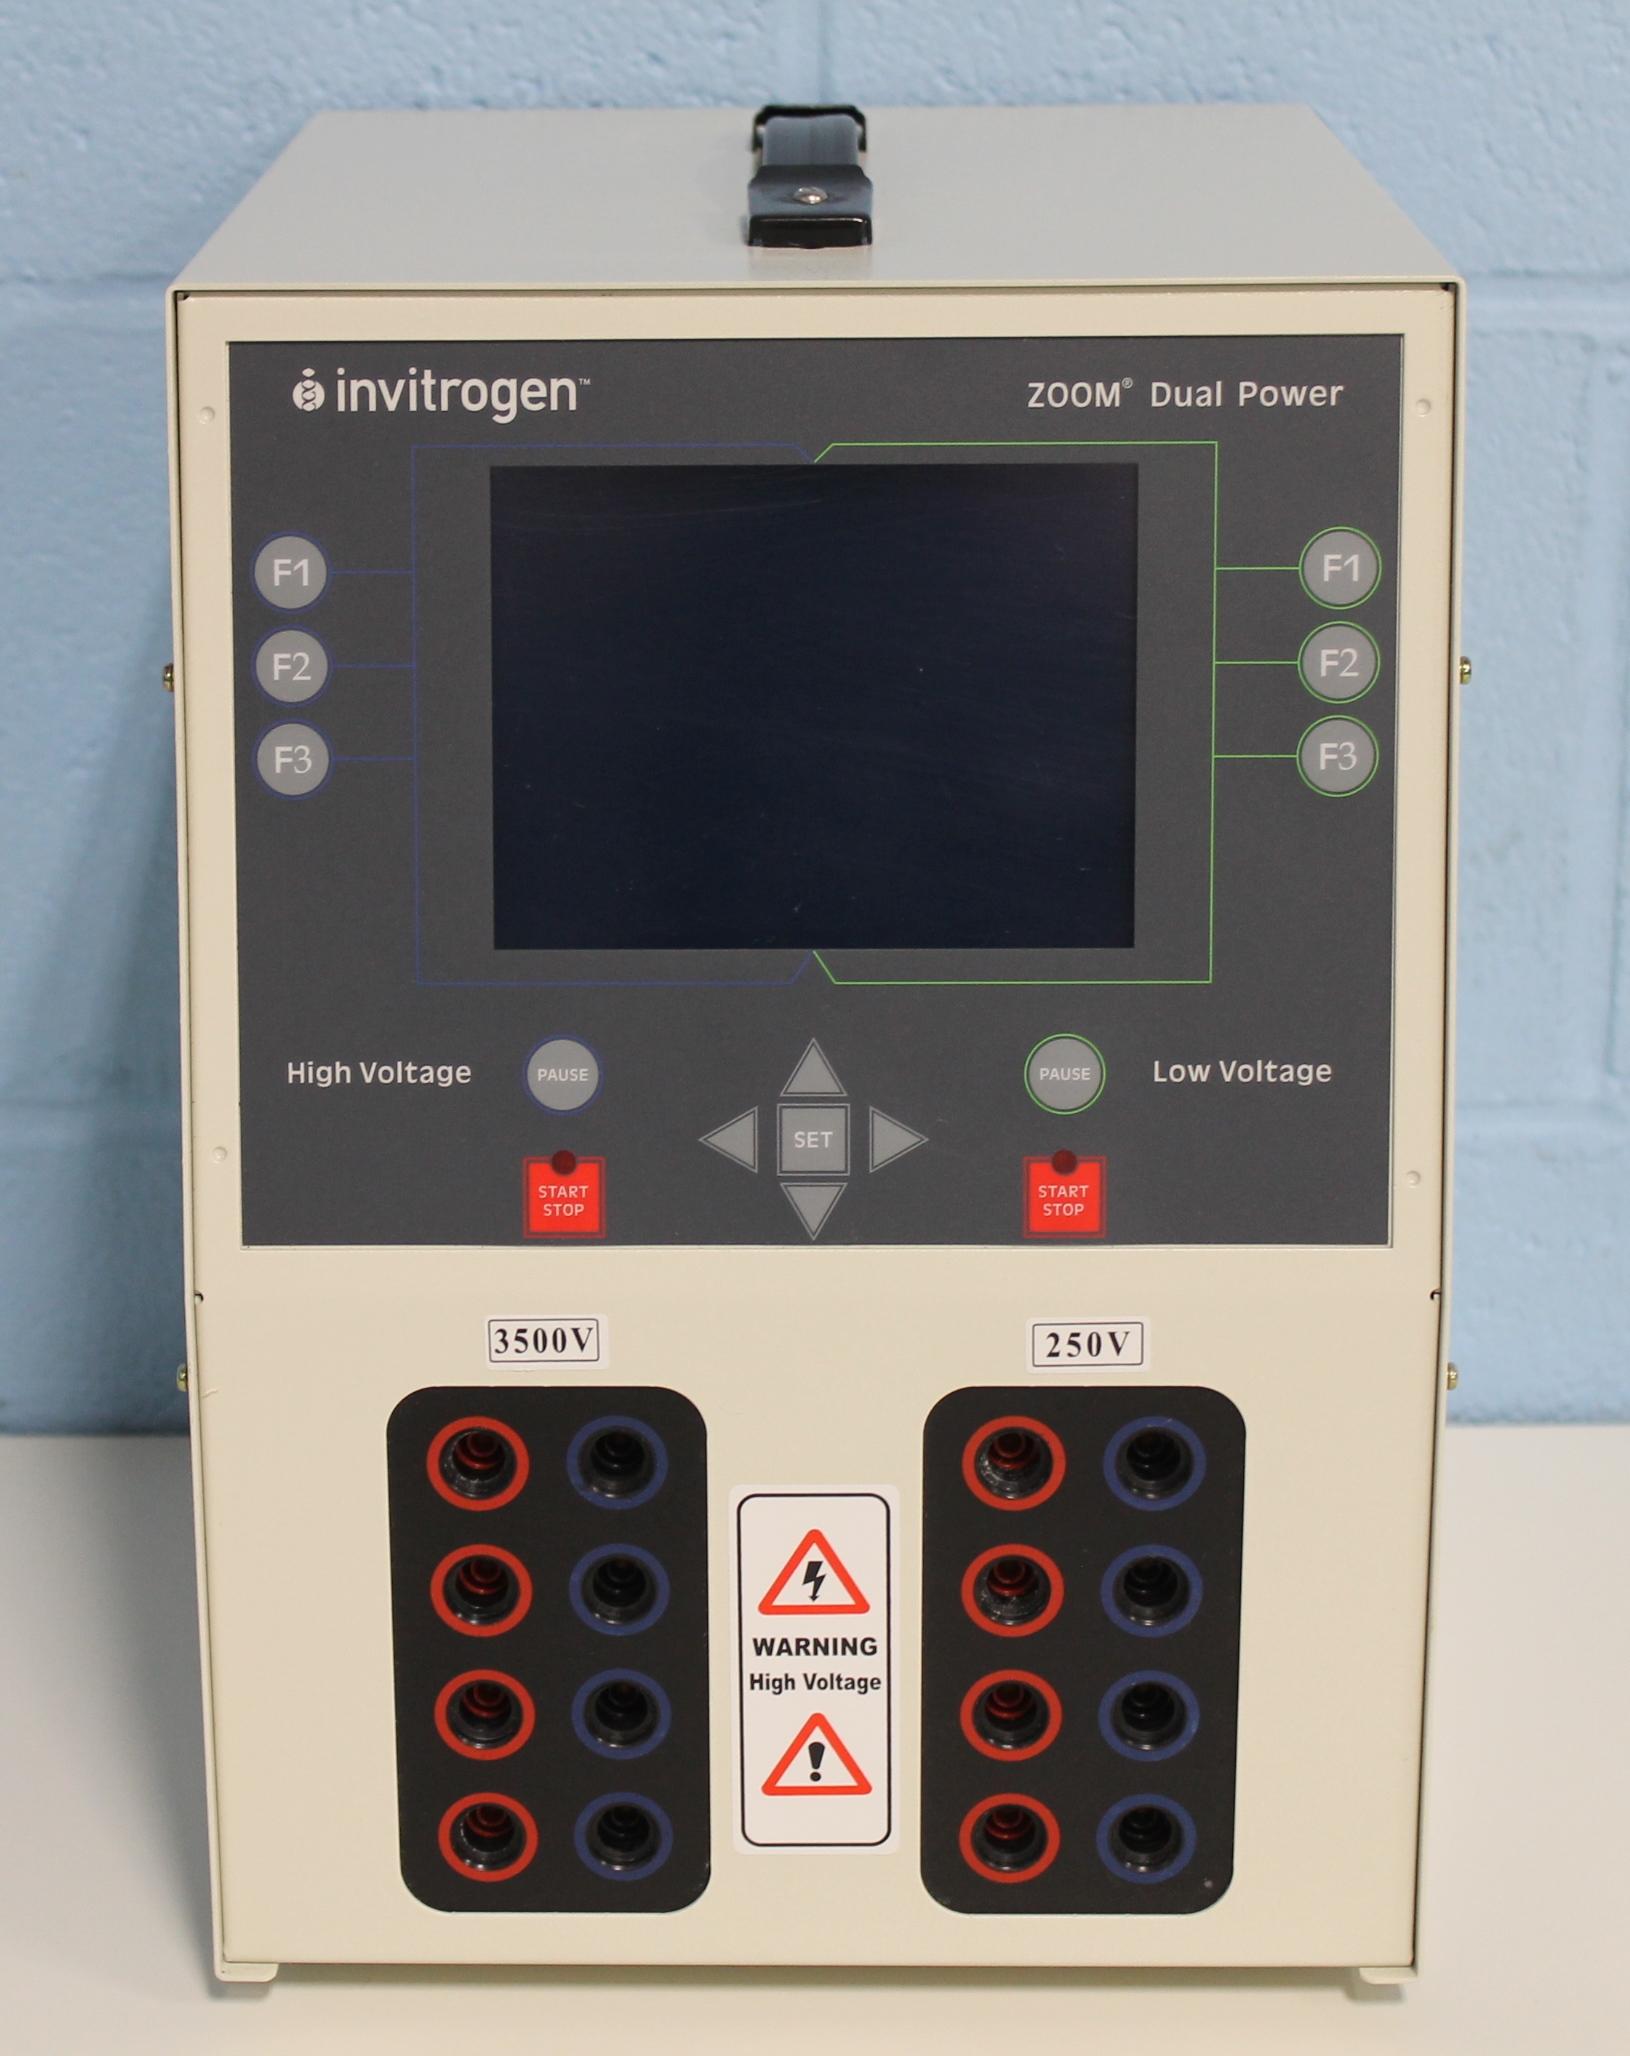 Refurbished Invitrogen Zp10001 Zoom Dual Power Supply Image